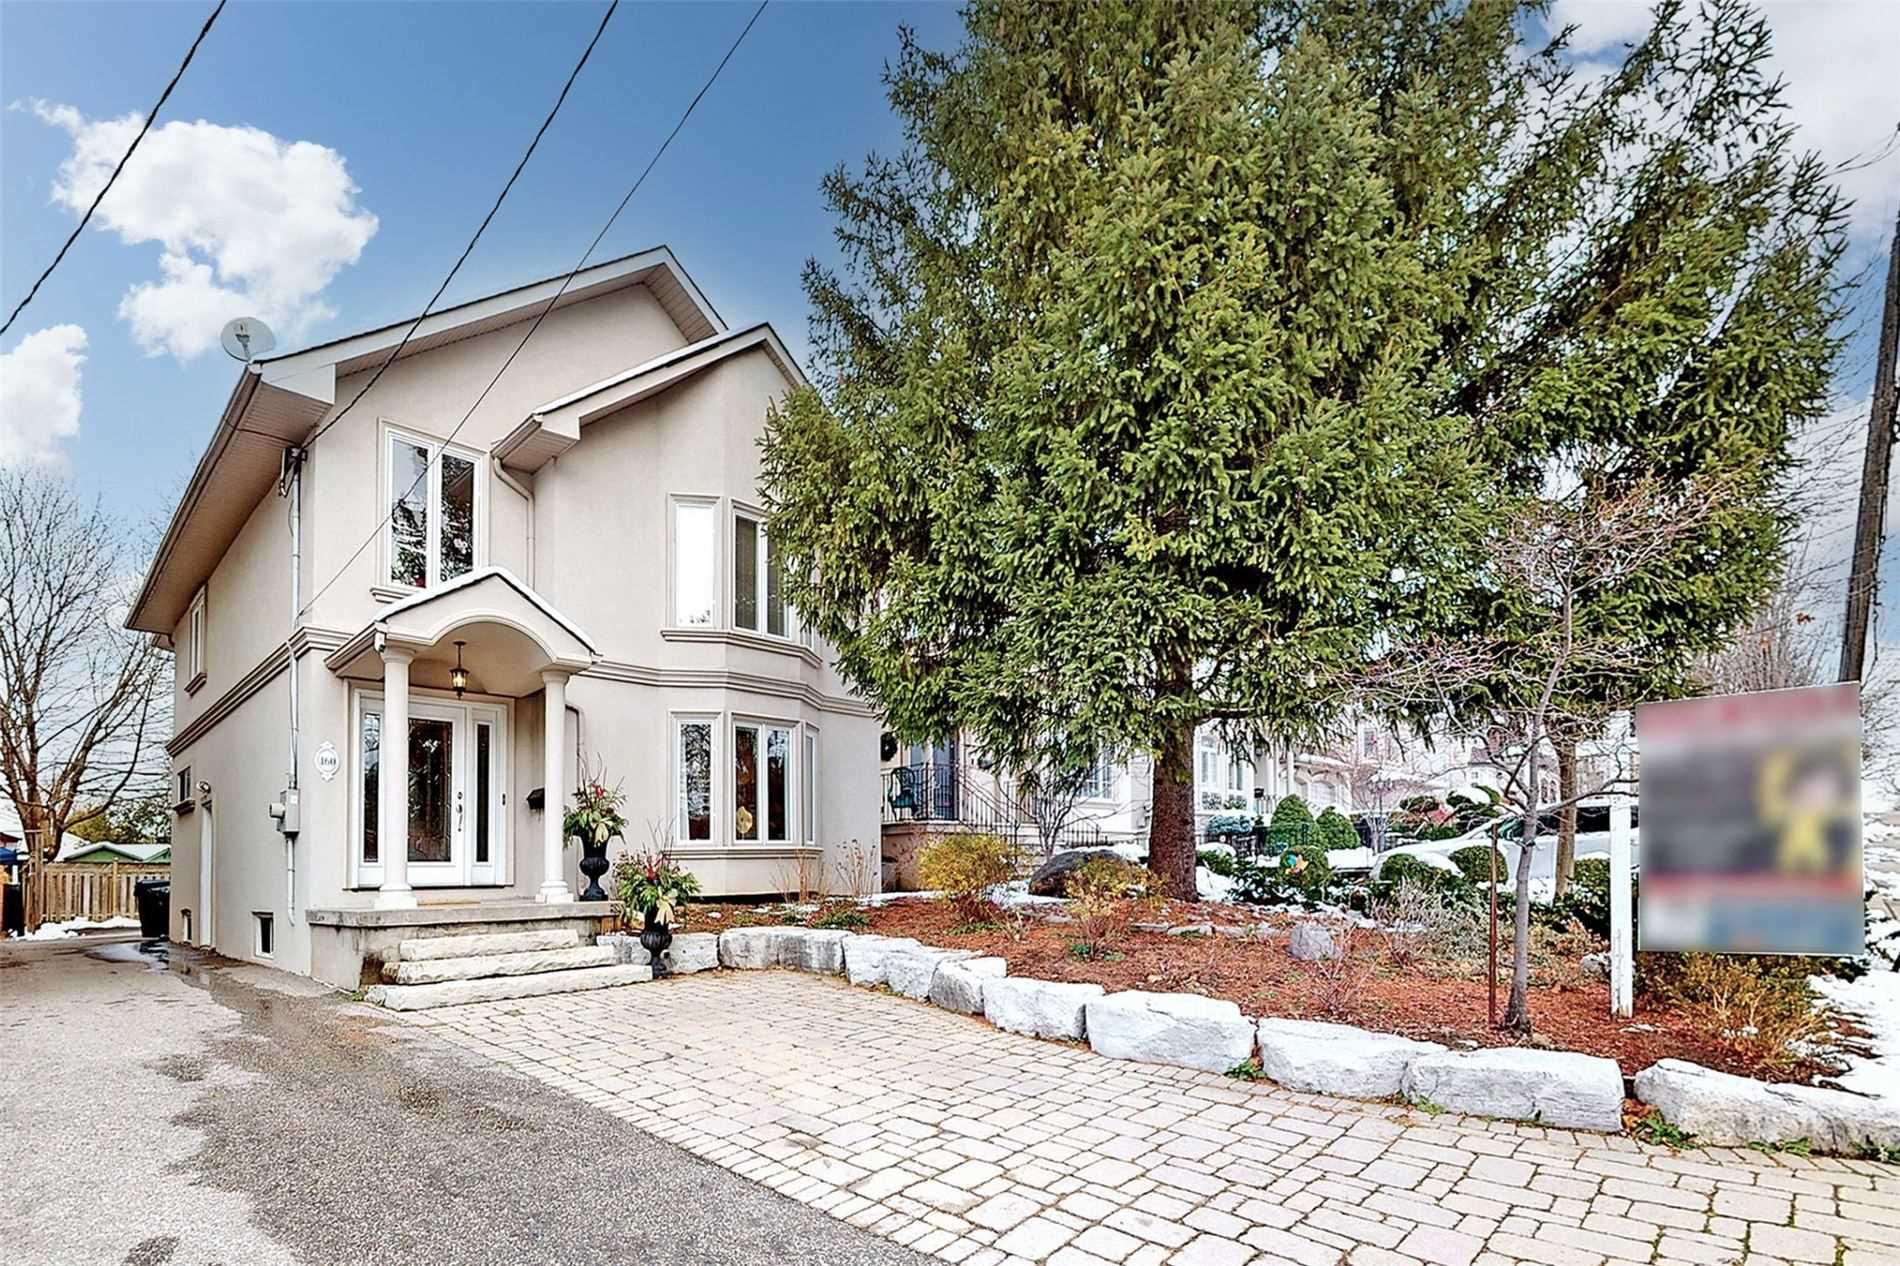 160 Elmwood Ave - C5254352 - $2,218,800